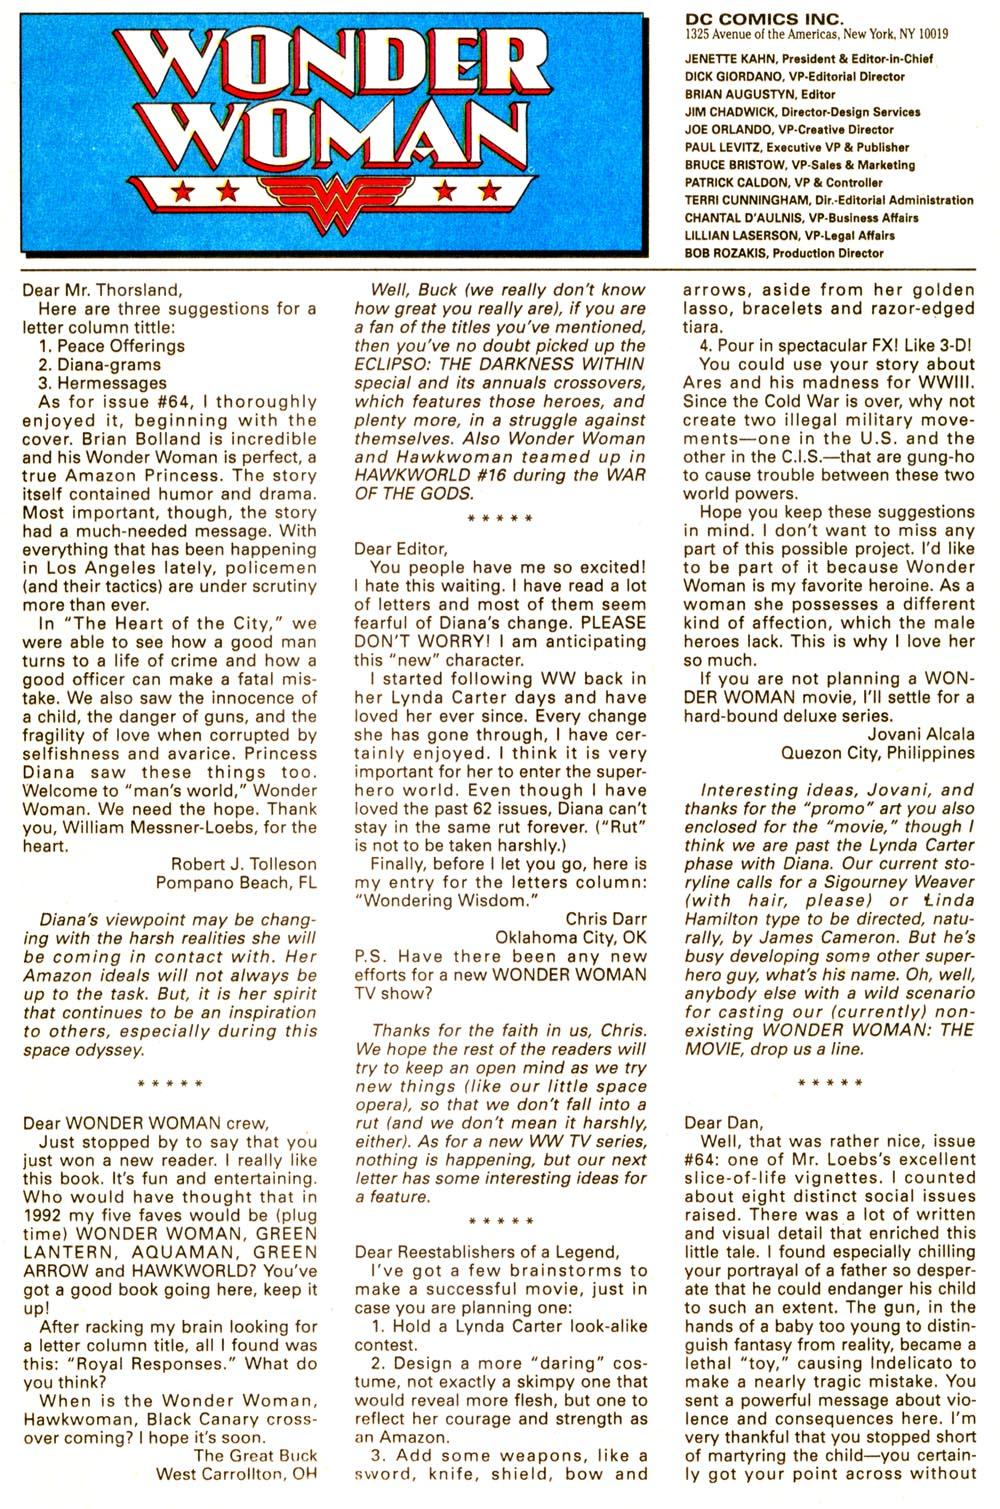 Read online Wonder Woman (1987) comic -  Issue #67 - 24